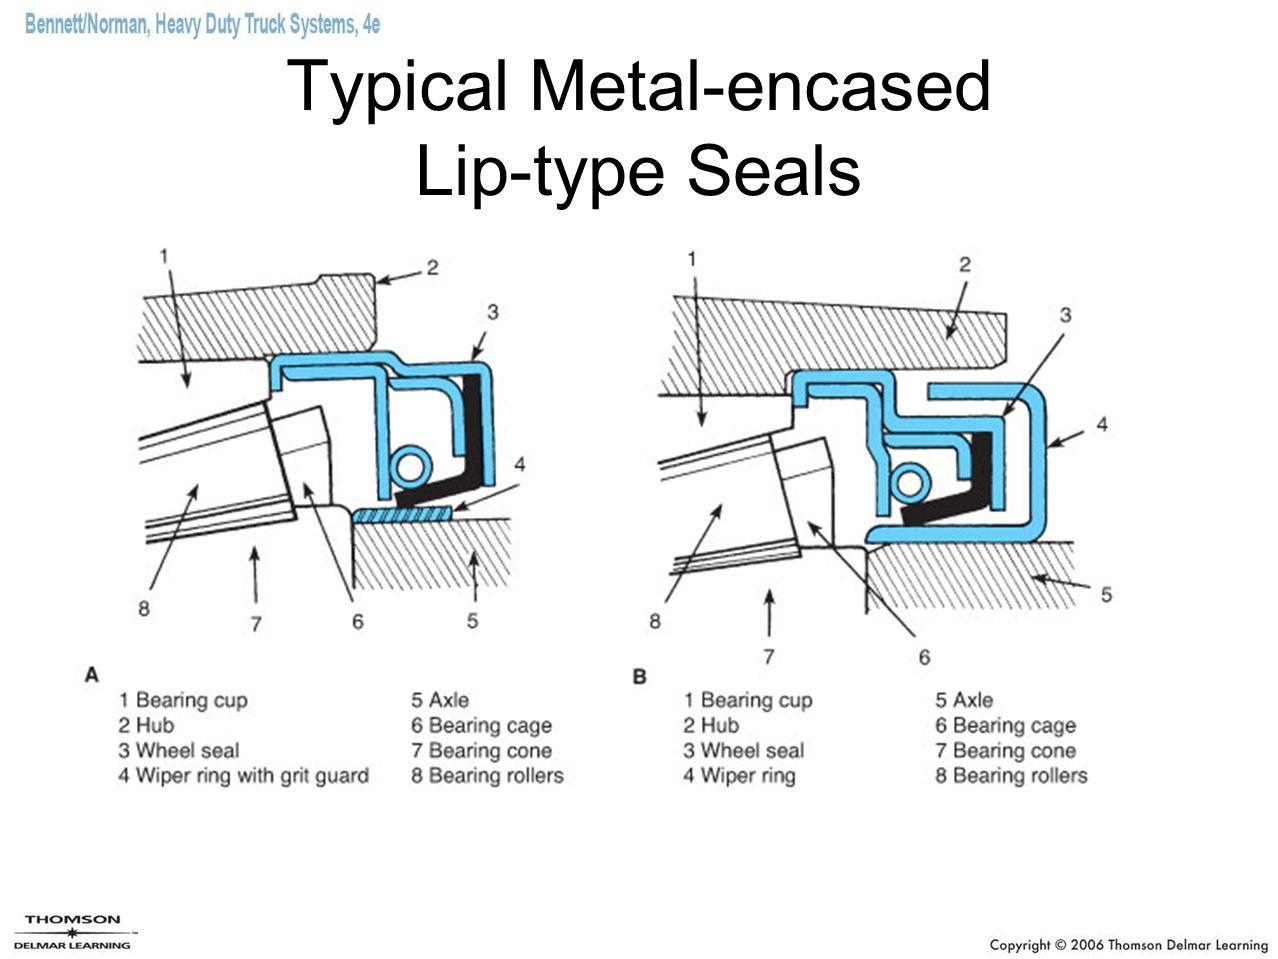 Typical Metal-encased Lip-type Seals